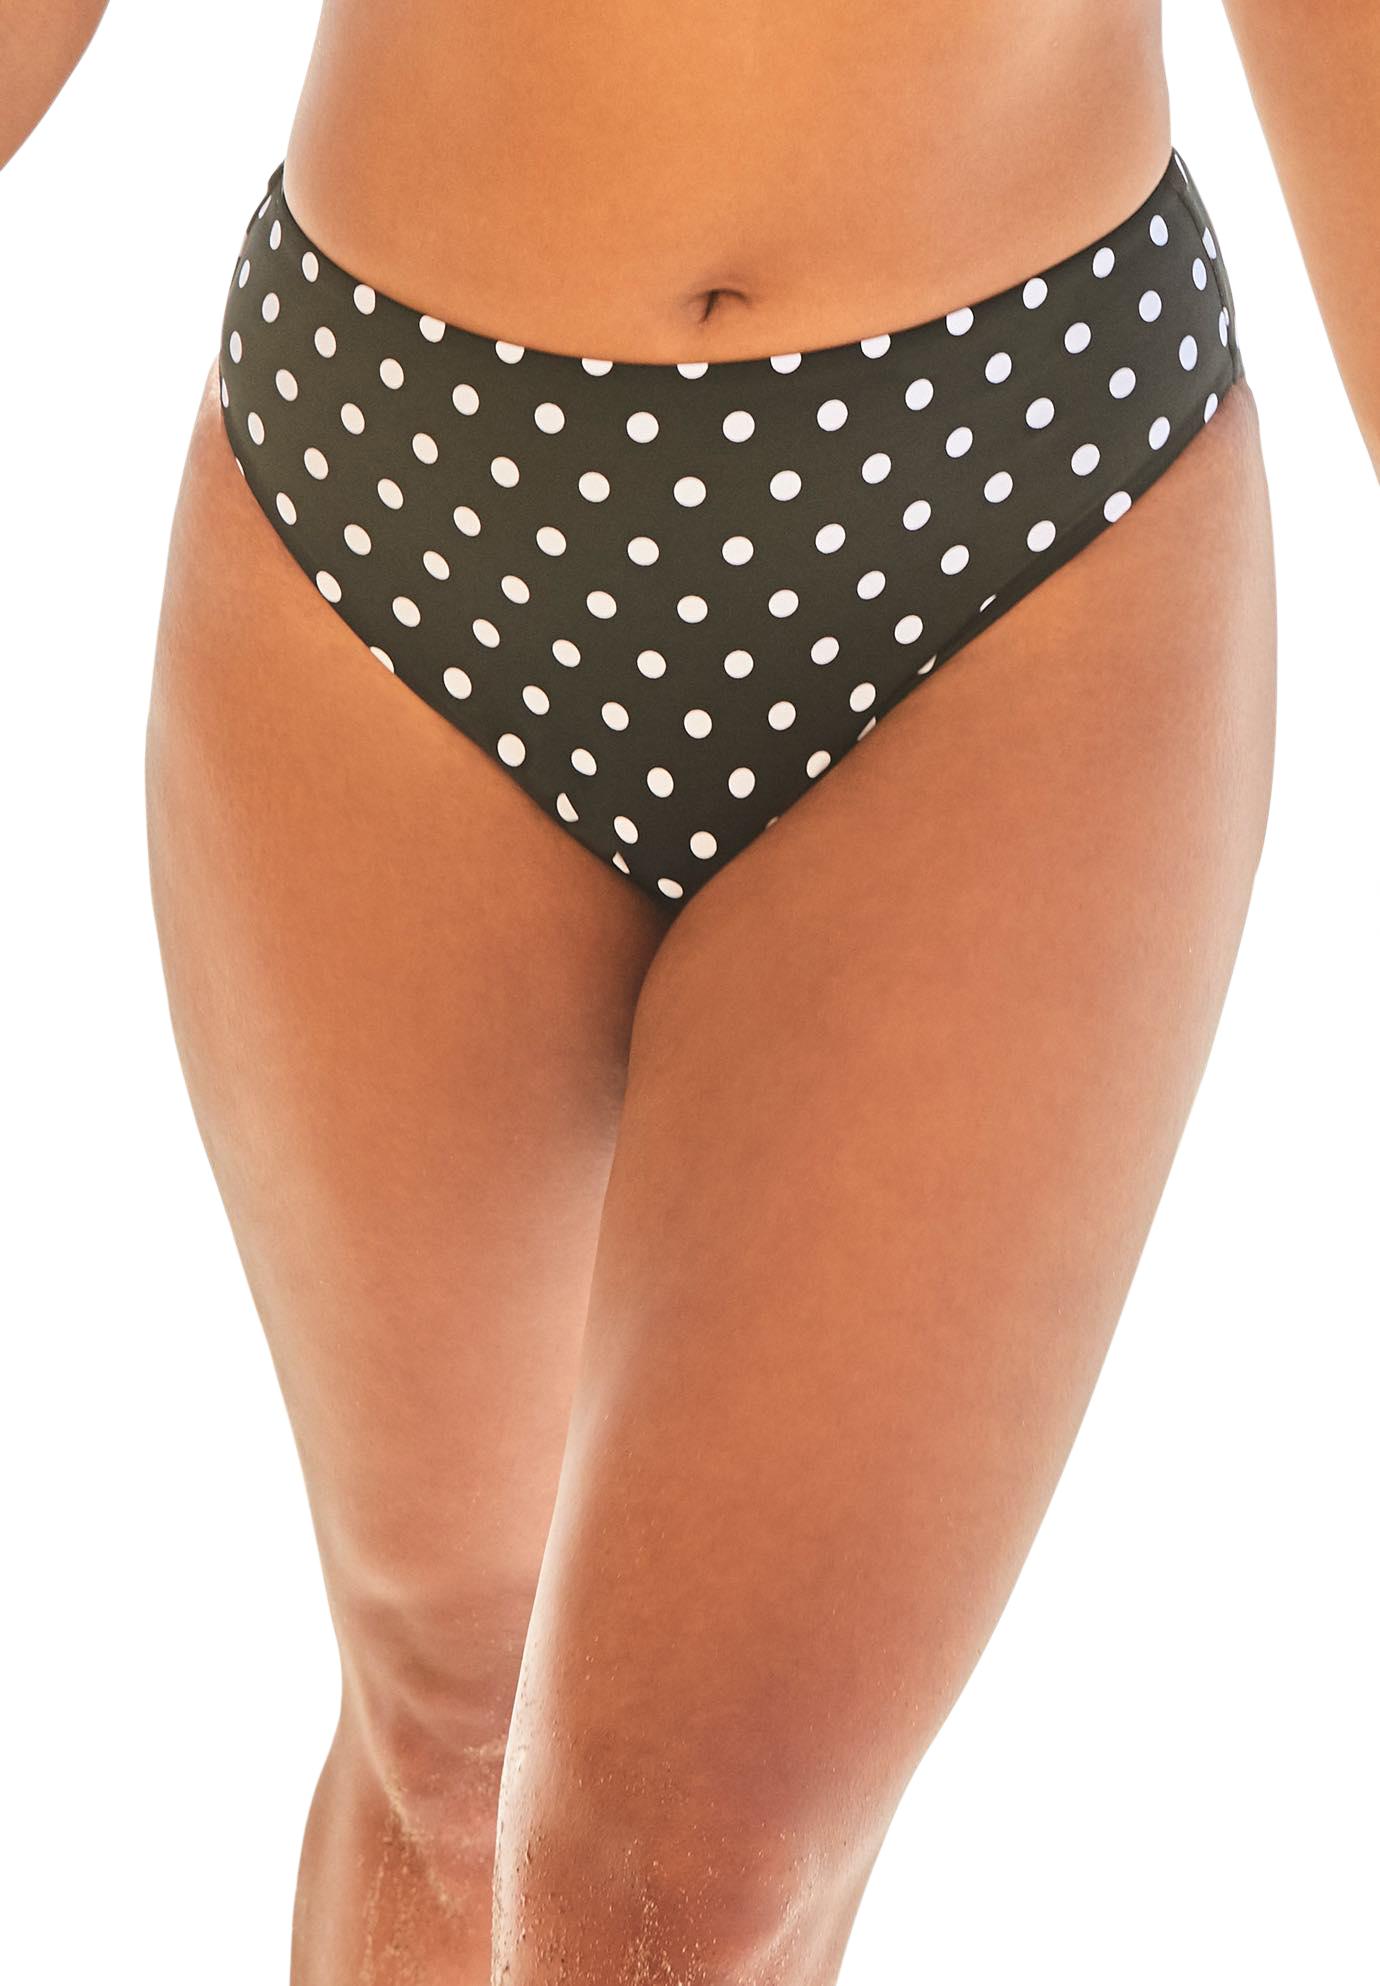 Plus Size Women's Ashley Graham Executive Bikini Bottom by Swimsuits For All in Black White Polka Dot